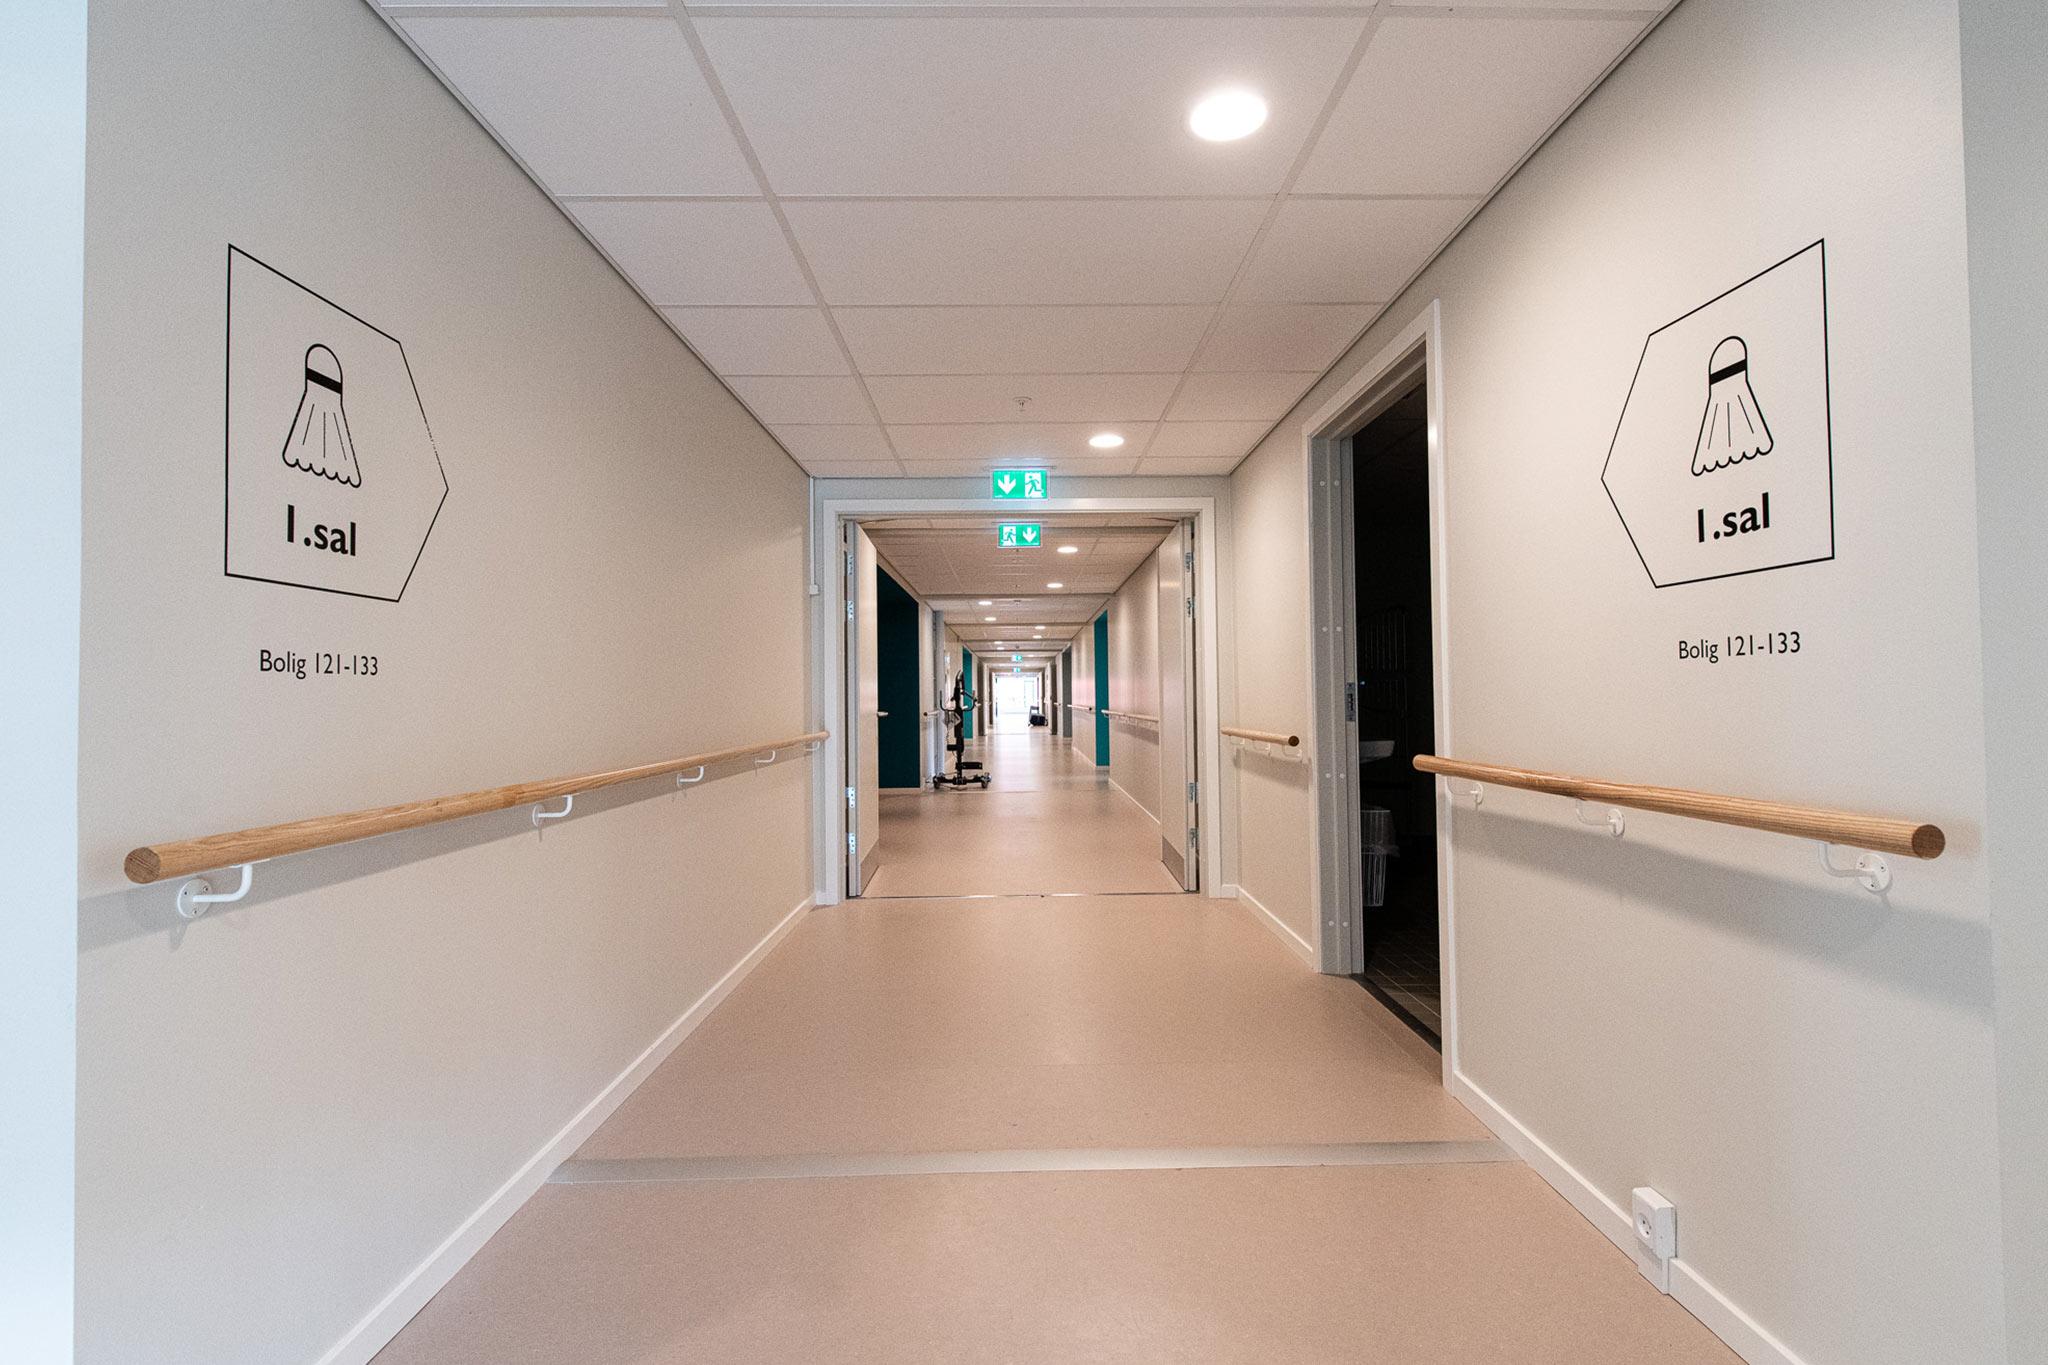 Care and nursing homes